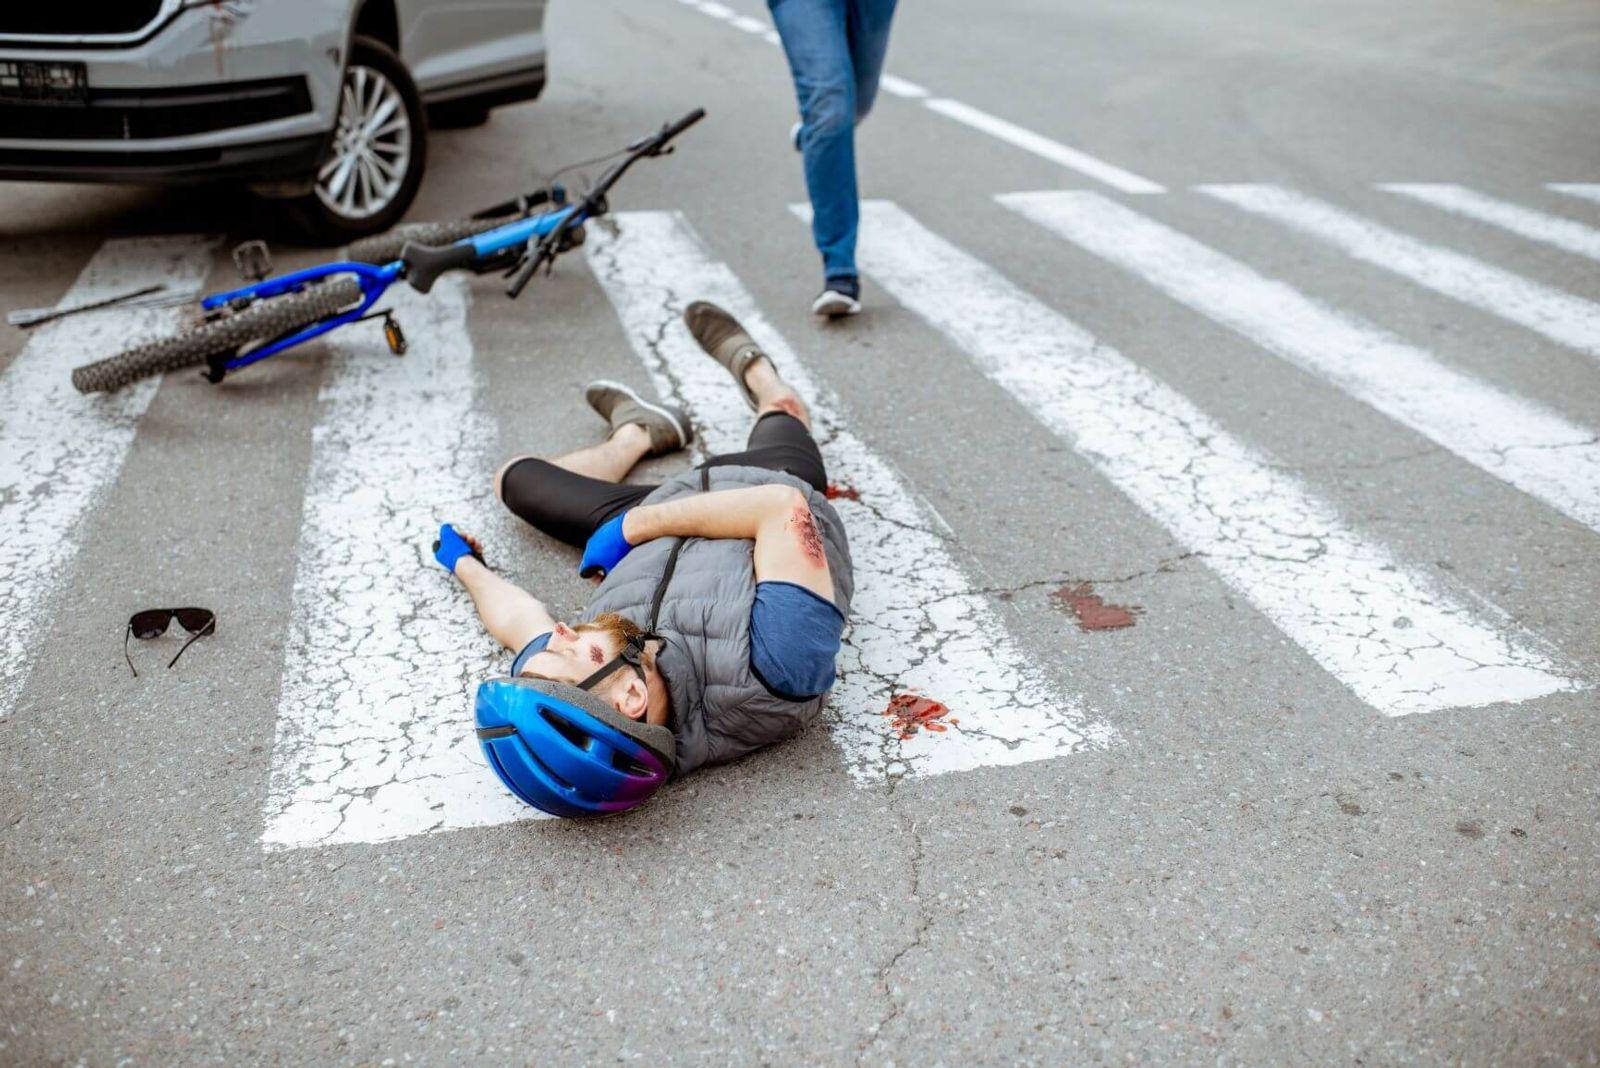 Bike Accident Statute of Limitations